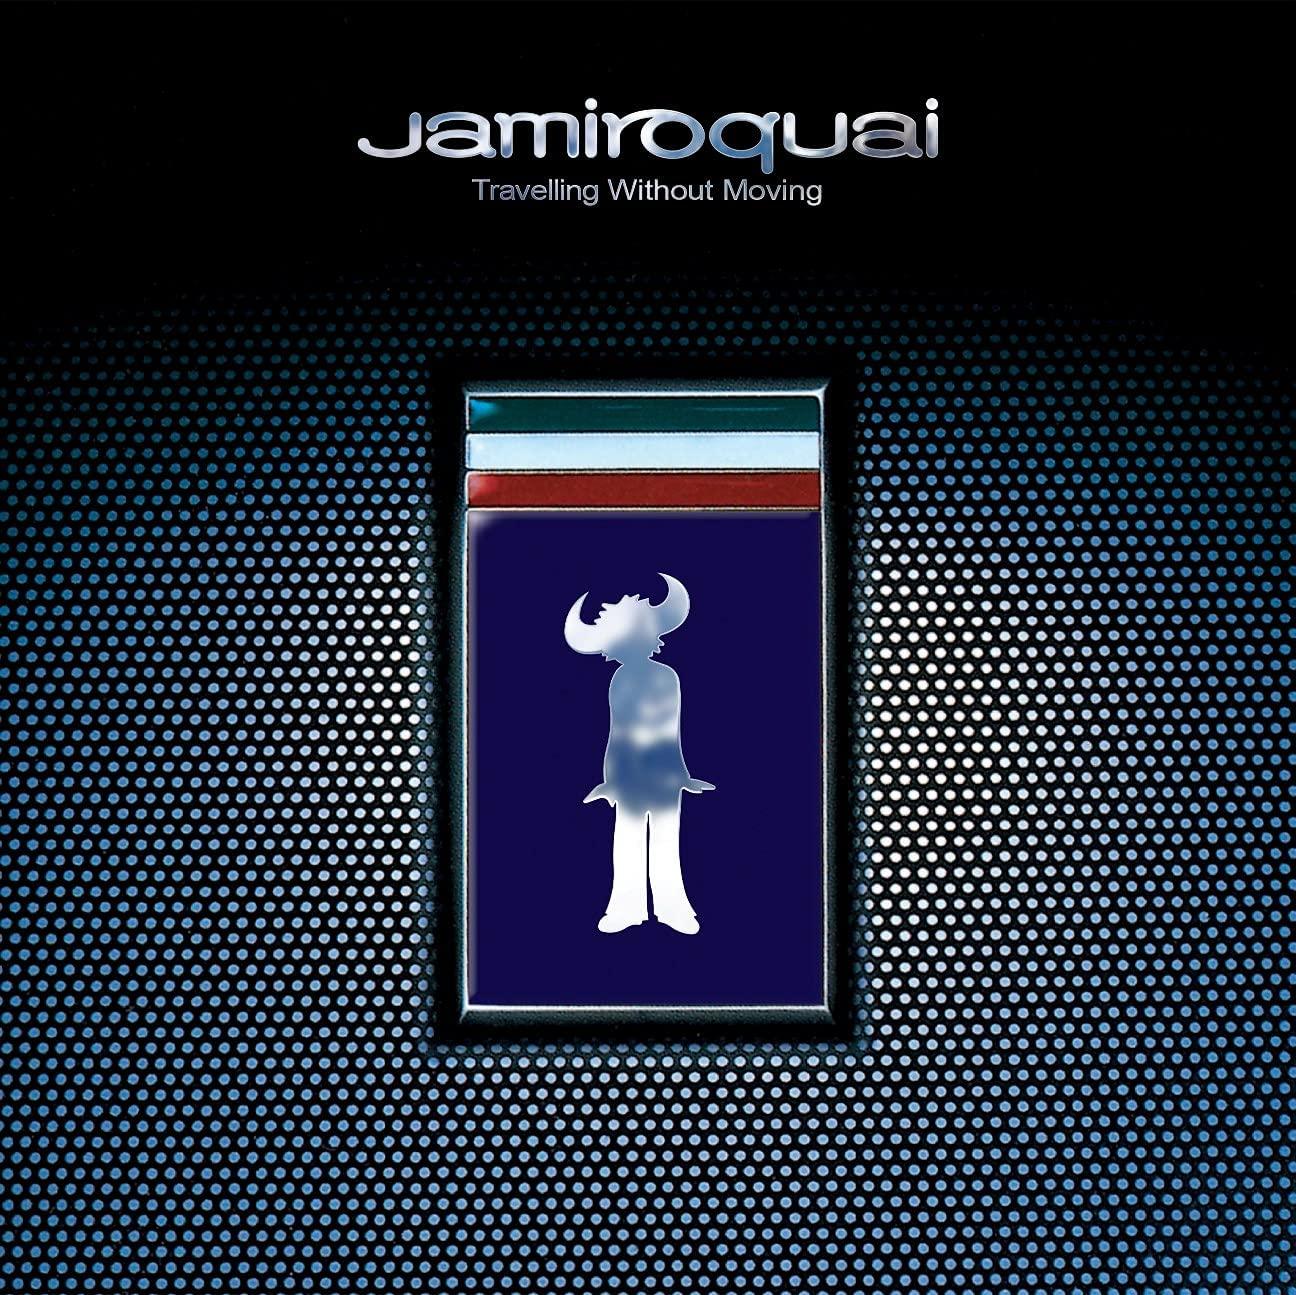 Jamiroquai / Travelling Without Moving 2LP yellow vinyl